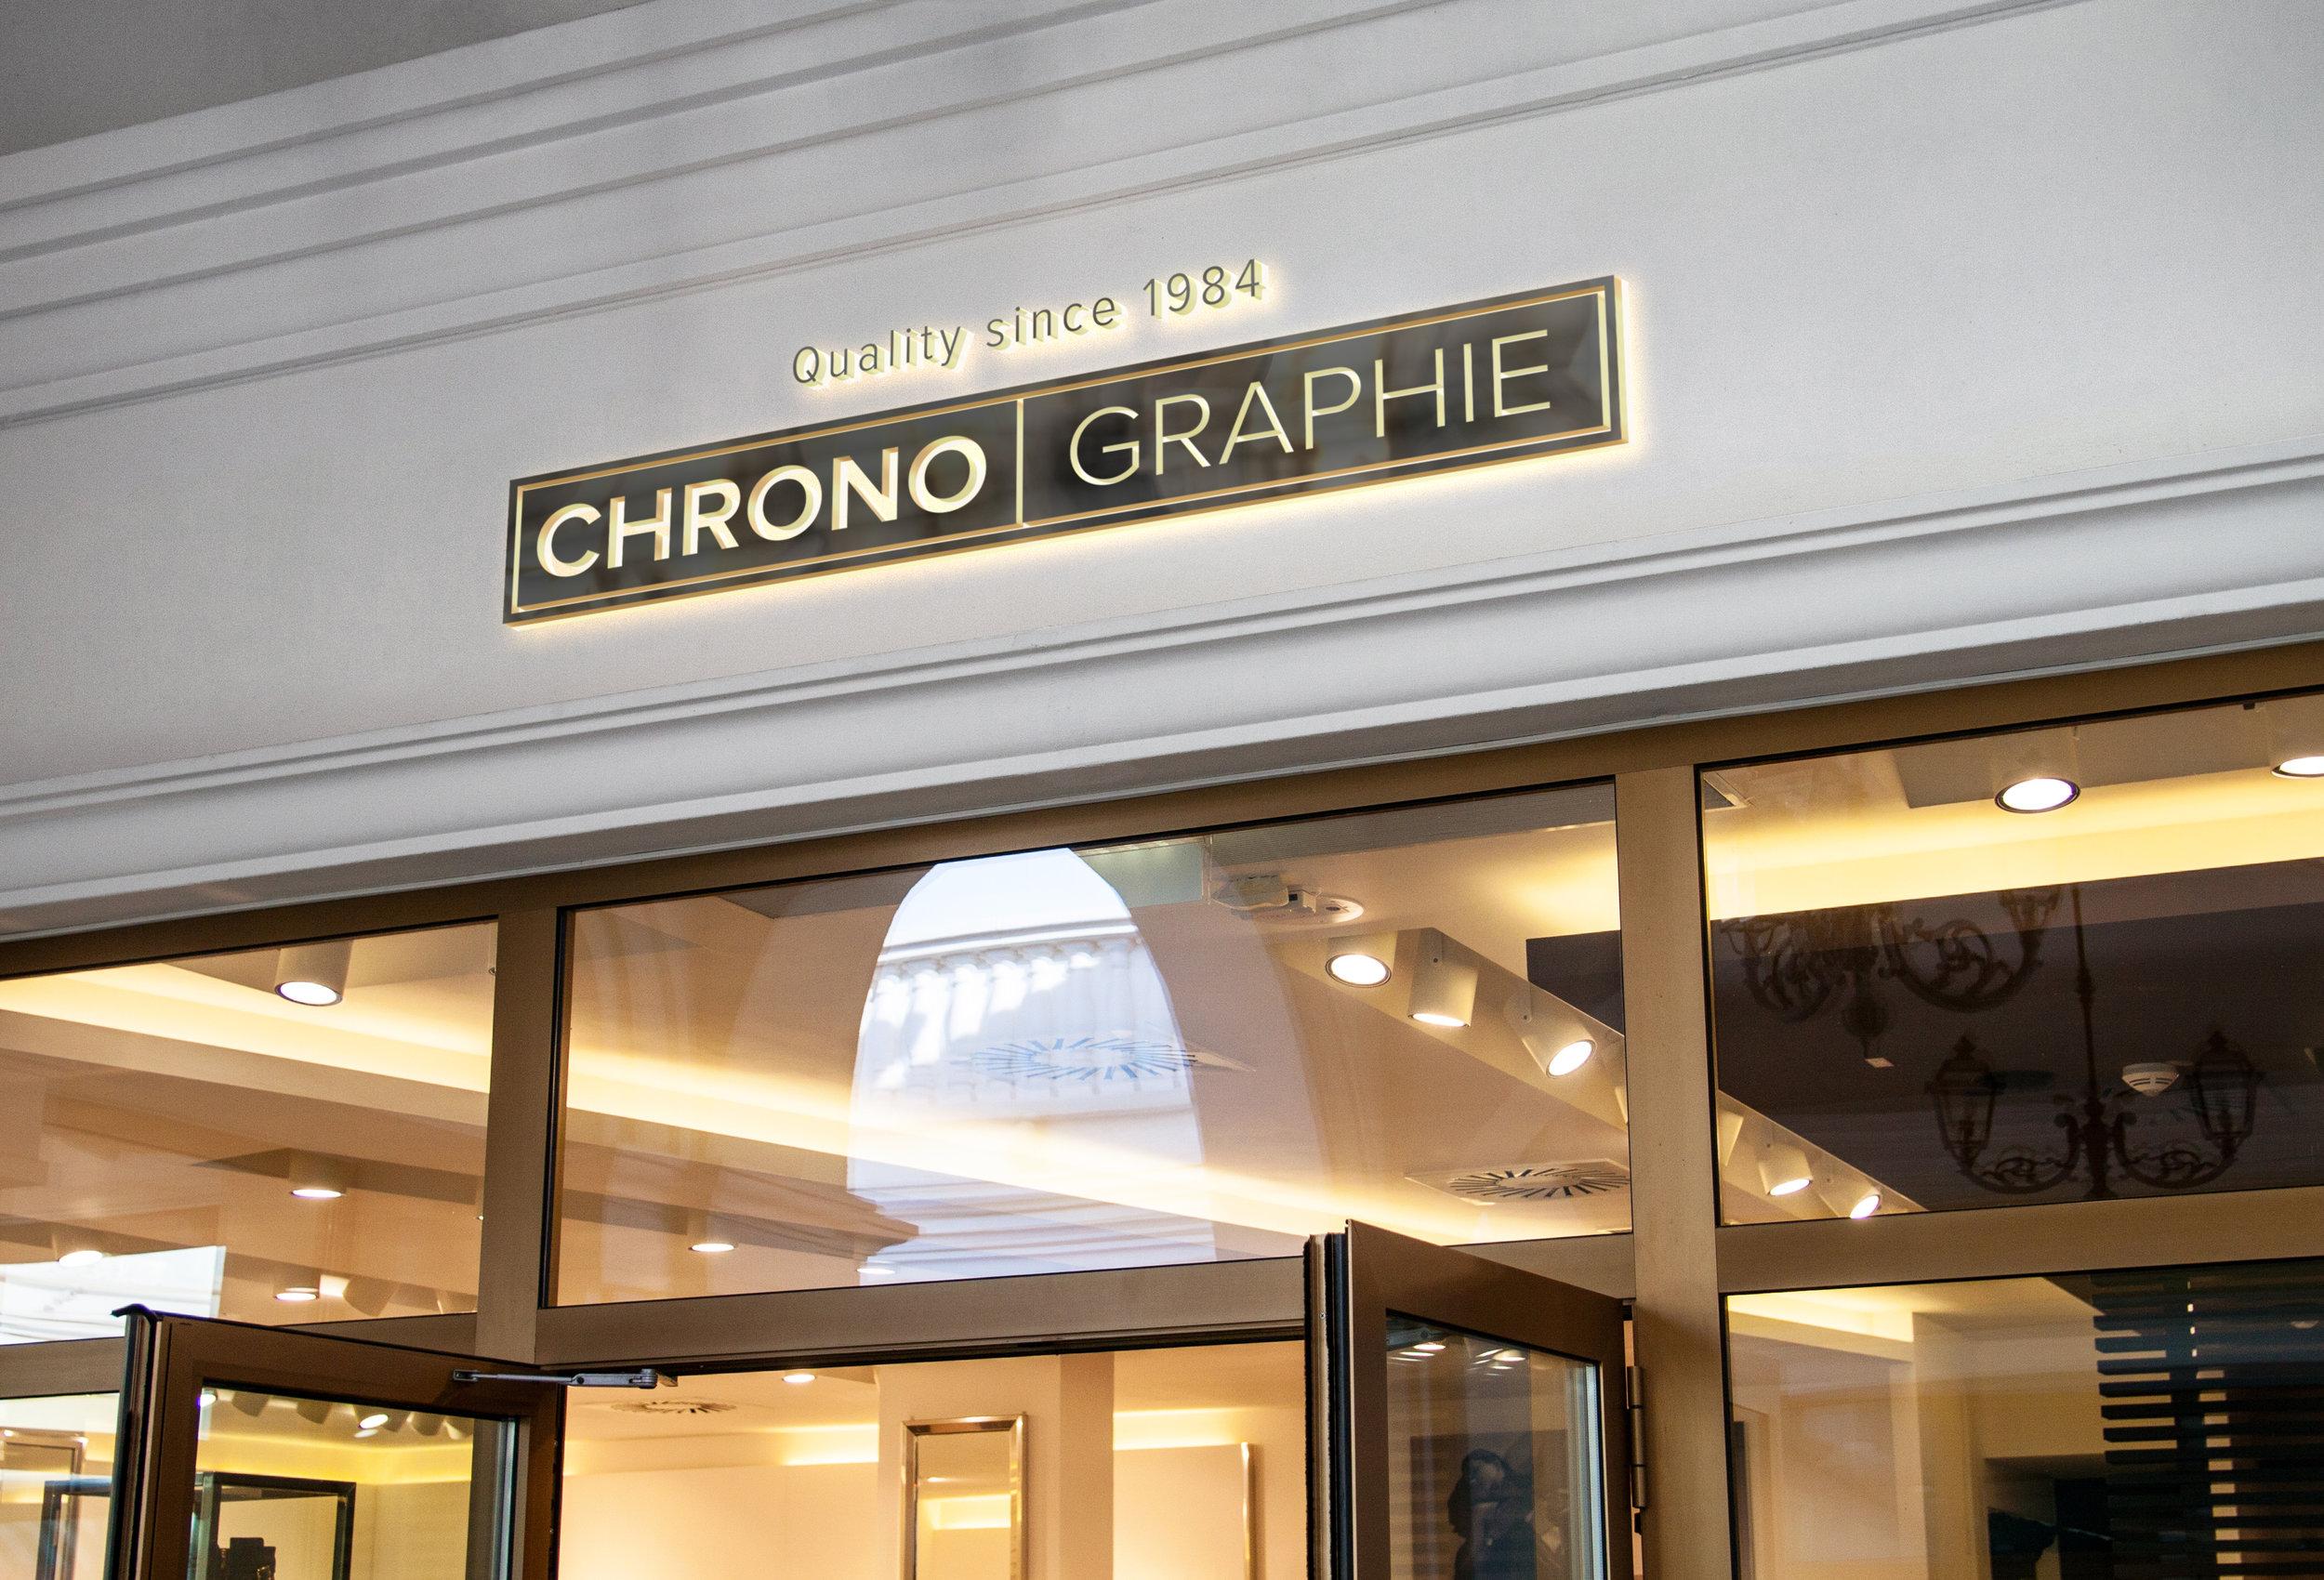 chrono_2.jpg